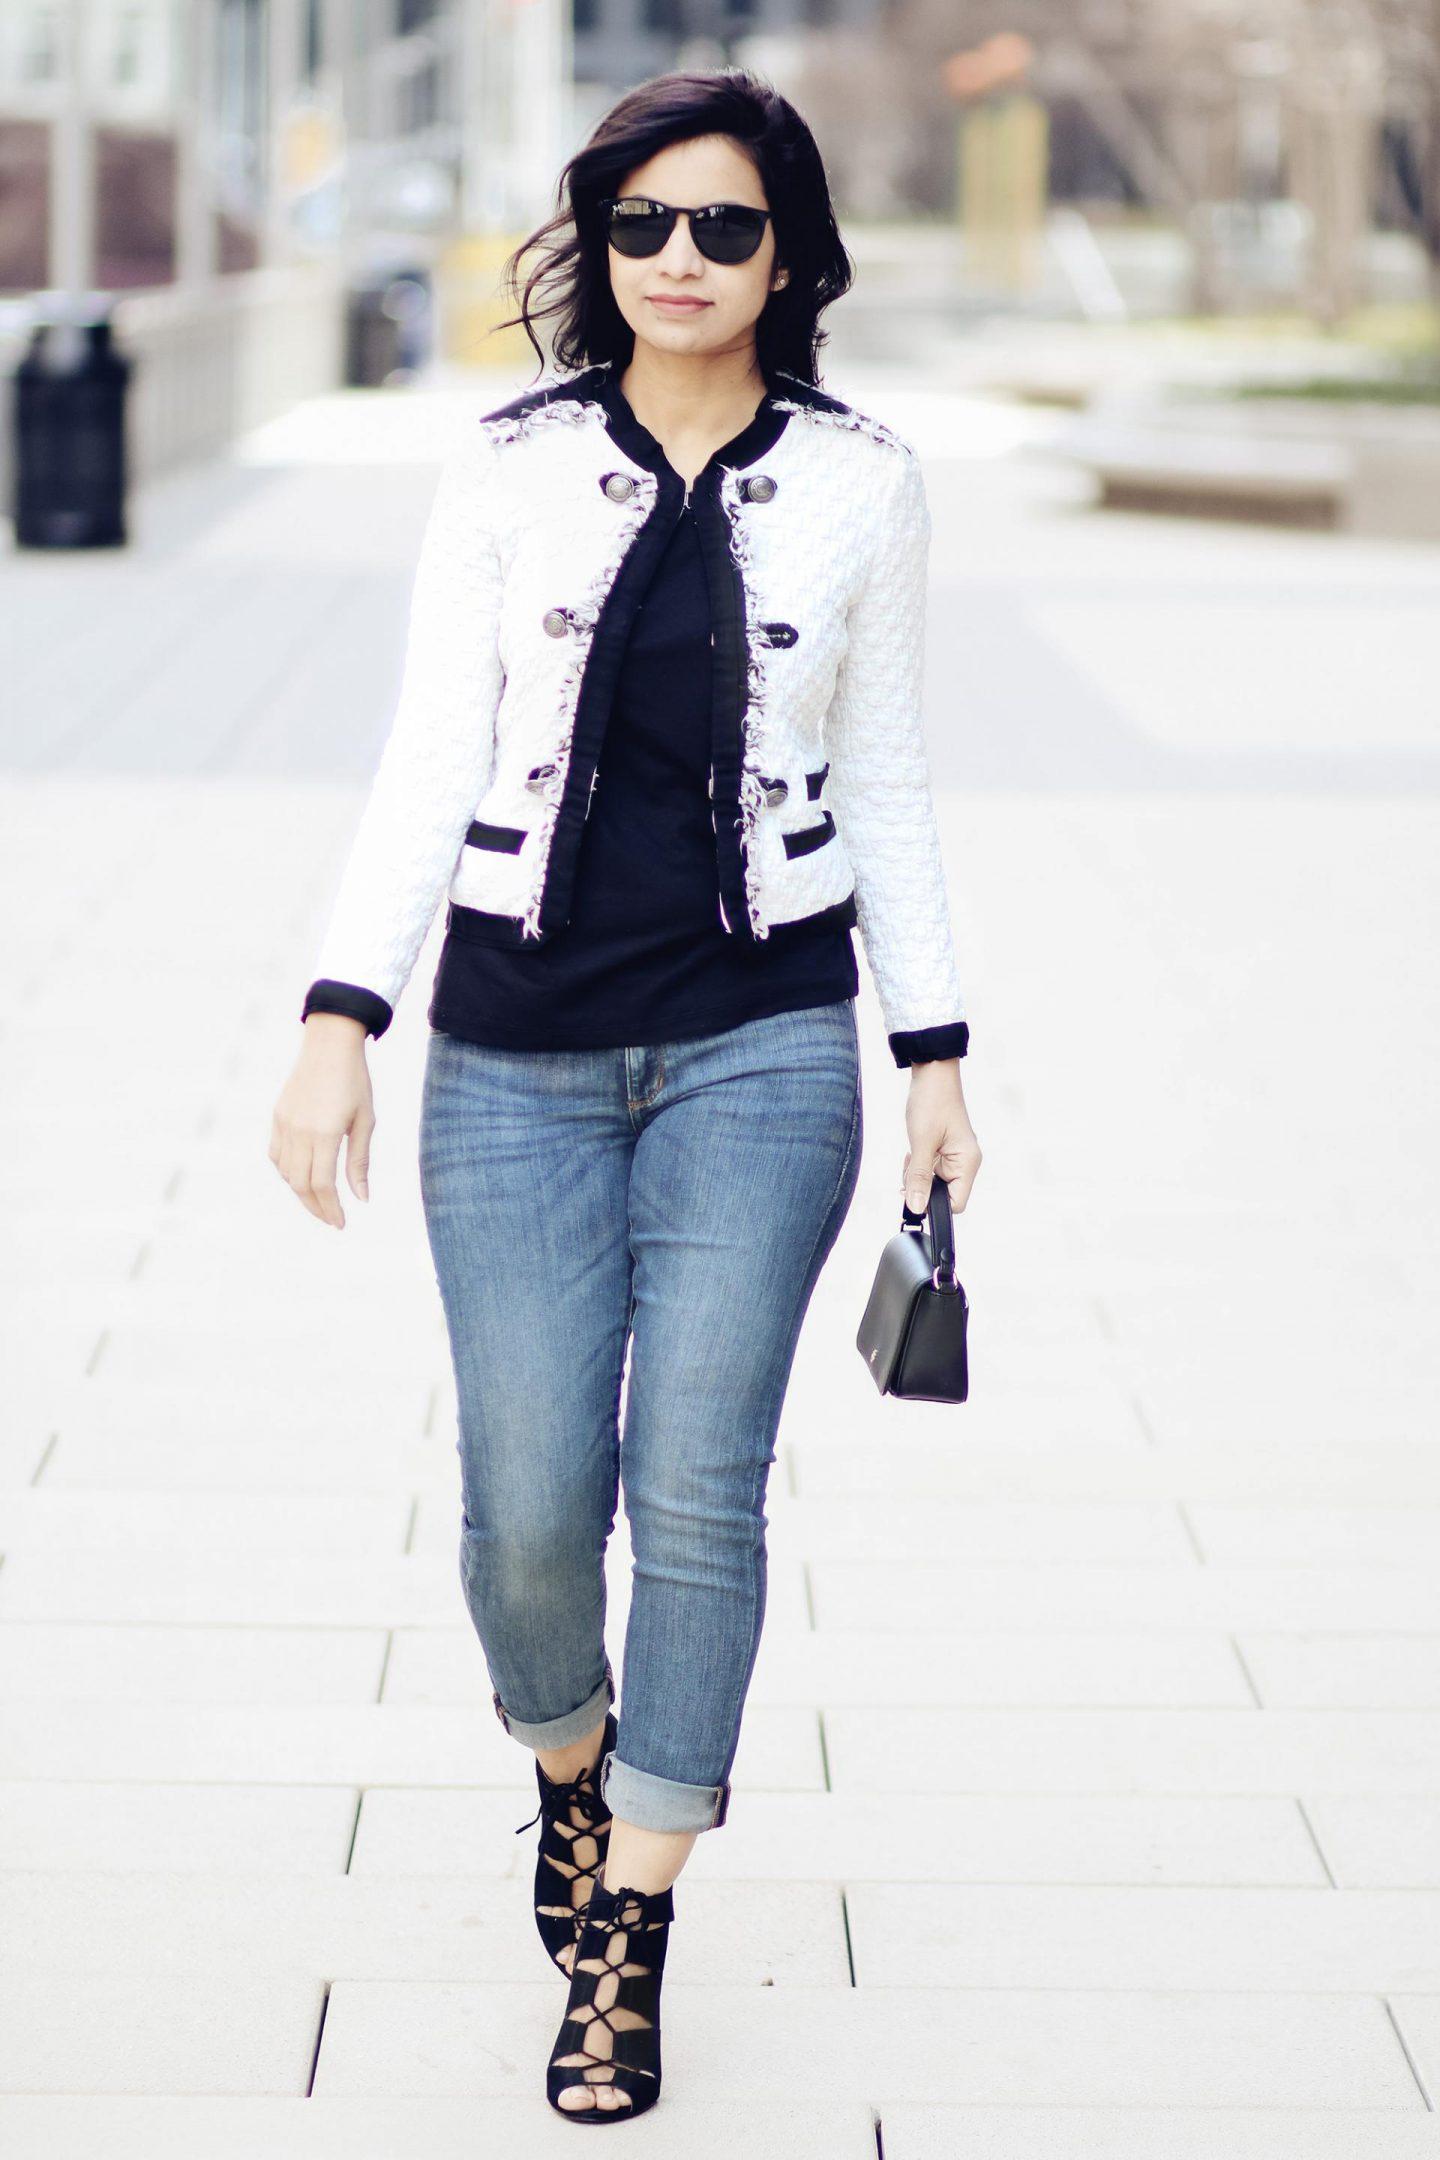 a7322fdb62f6 Chanel Style Jacket – styleroundtheclock